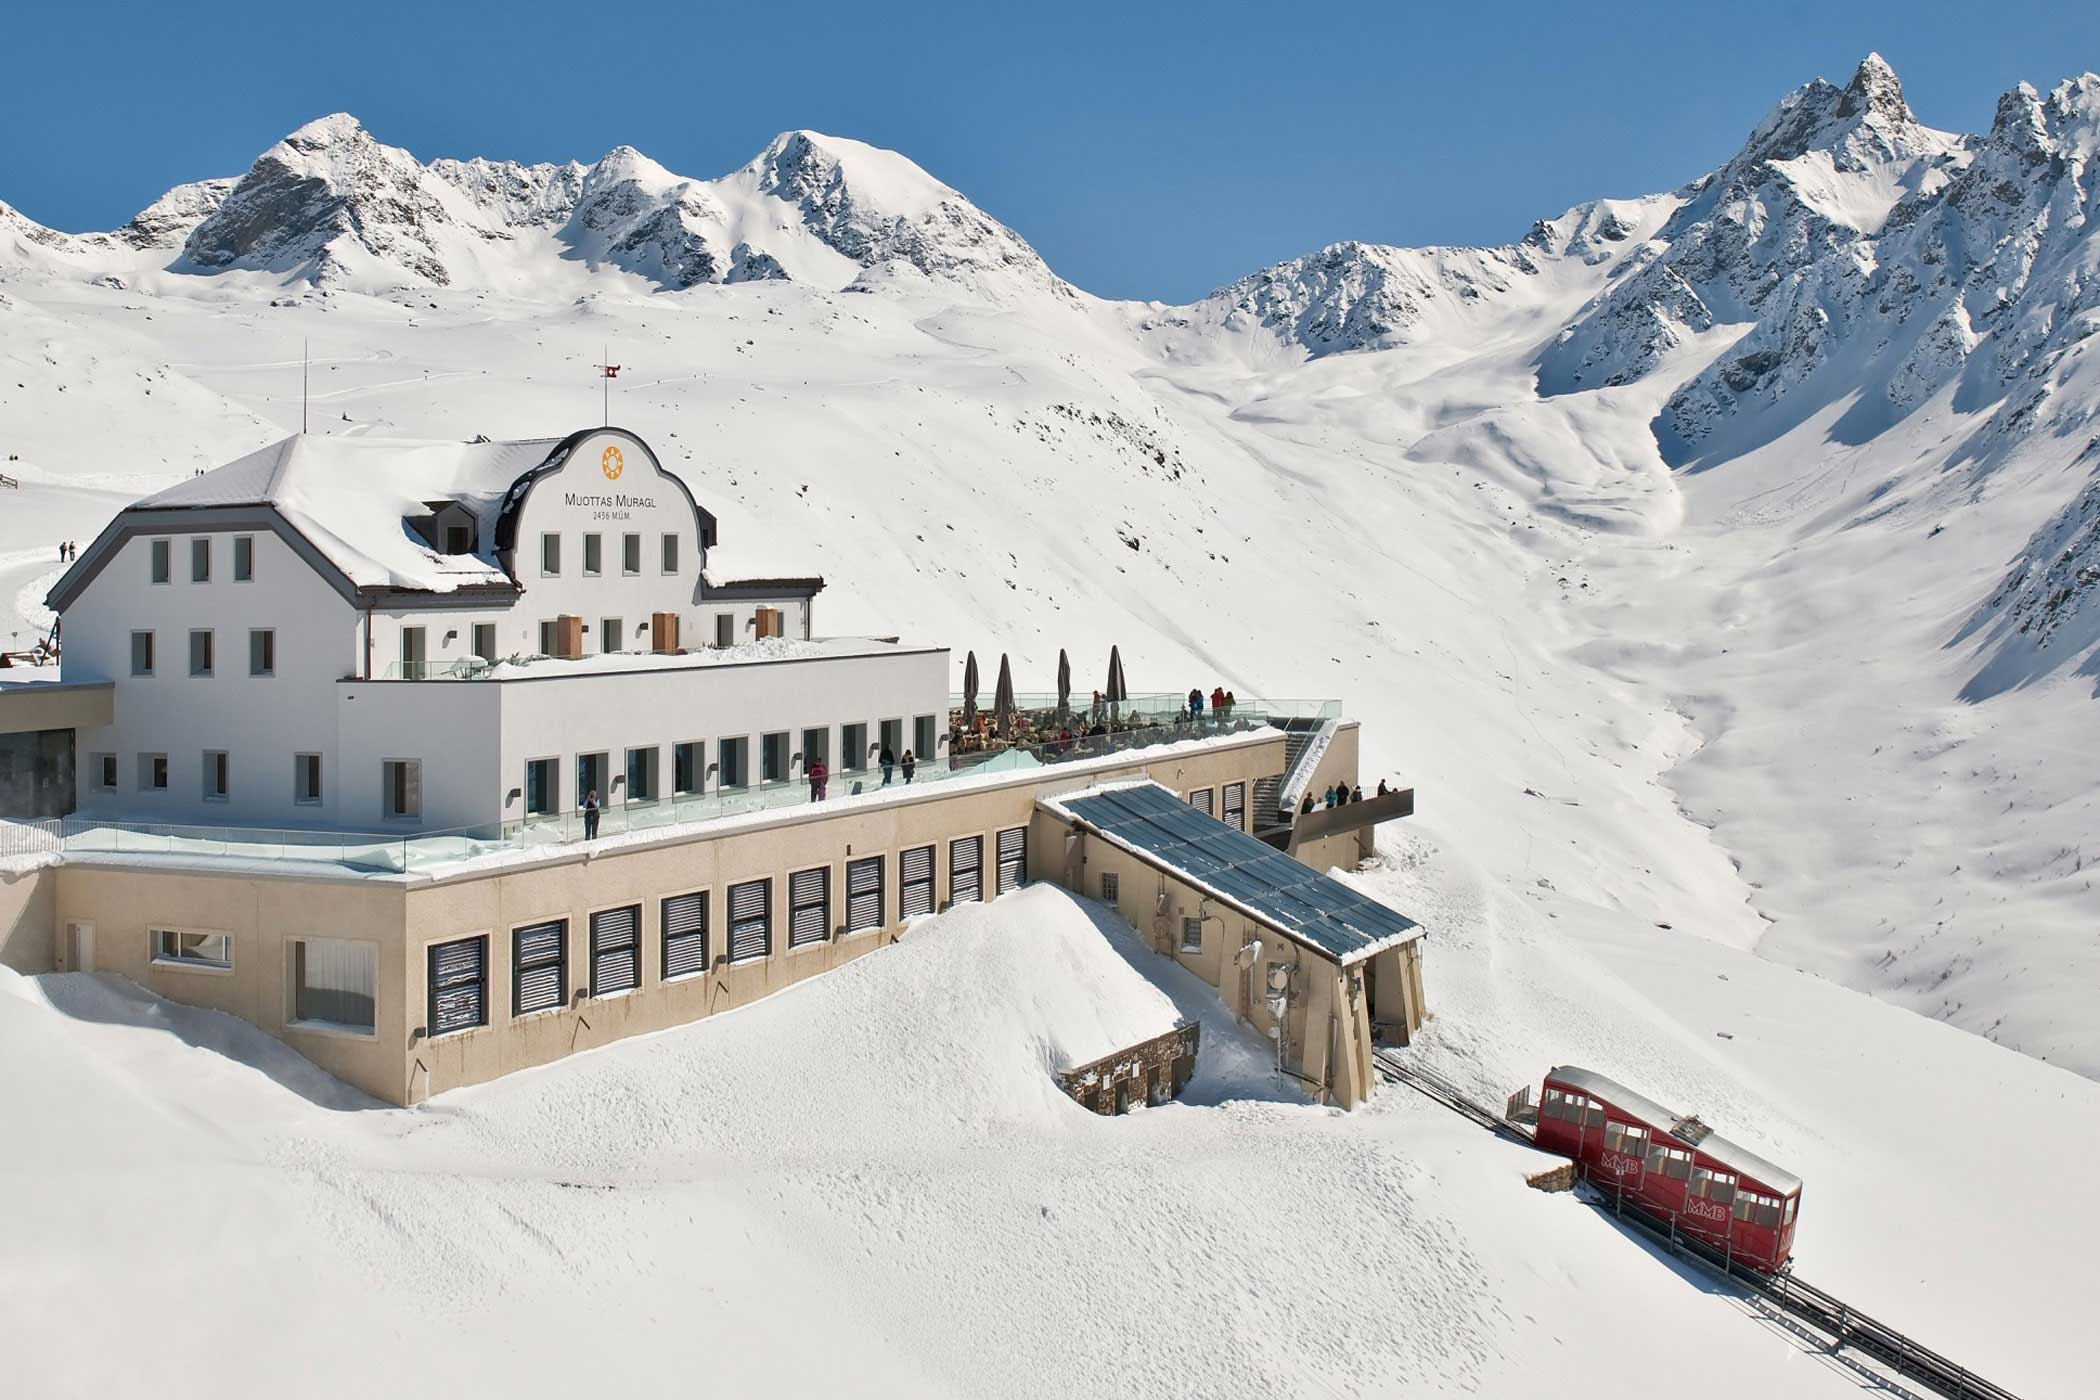 Hotel auf Muottas Muragl im Winter